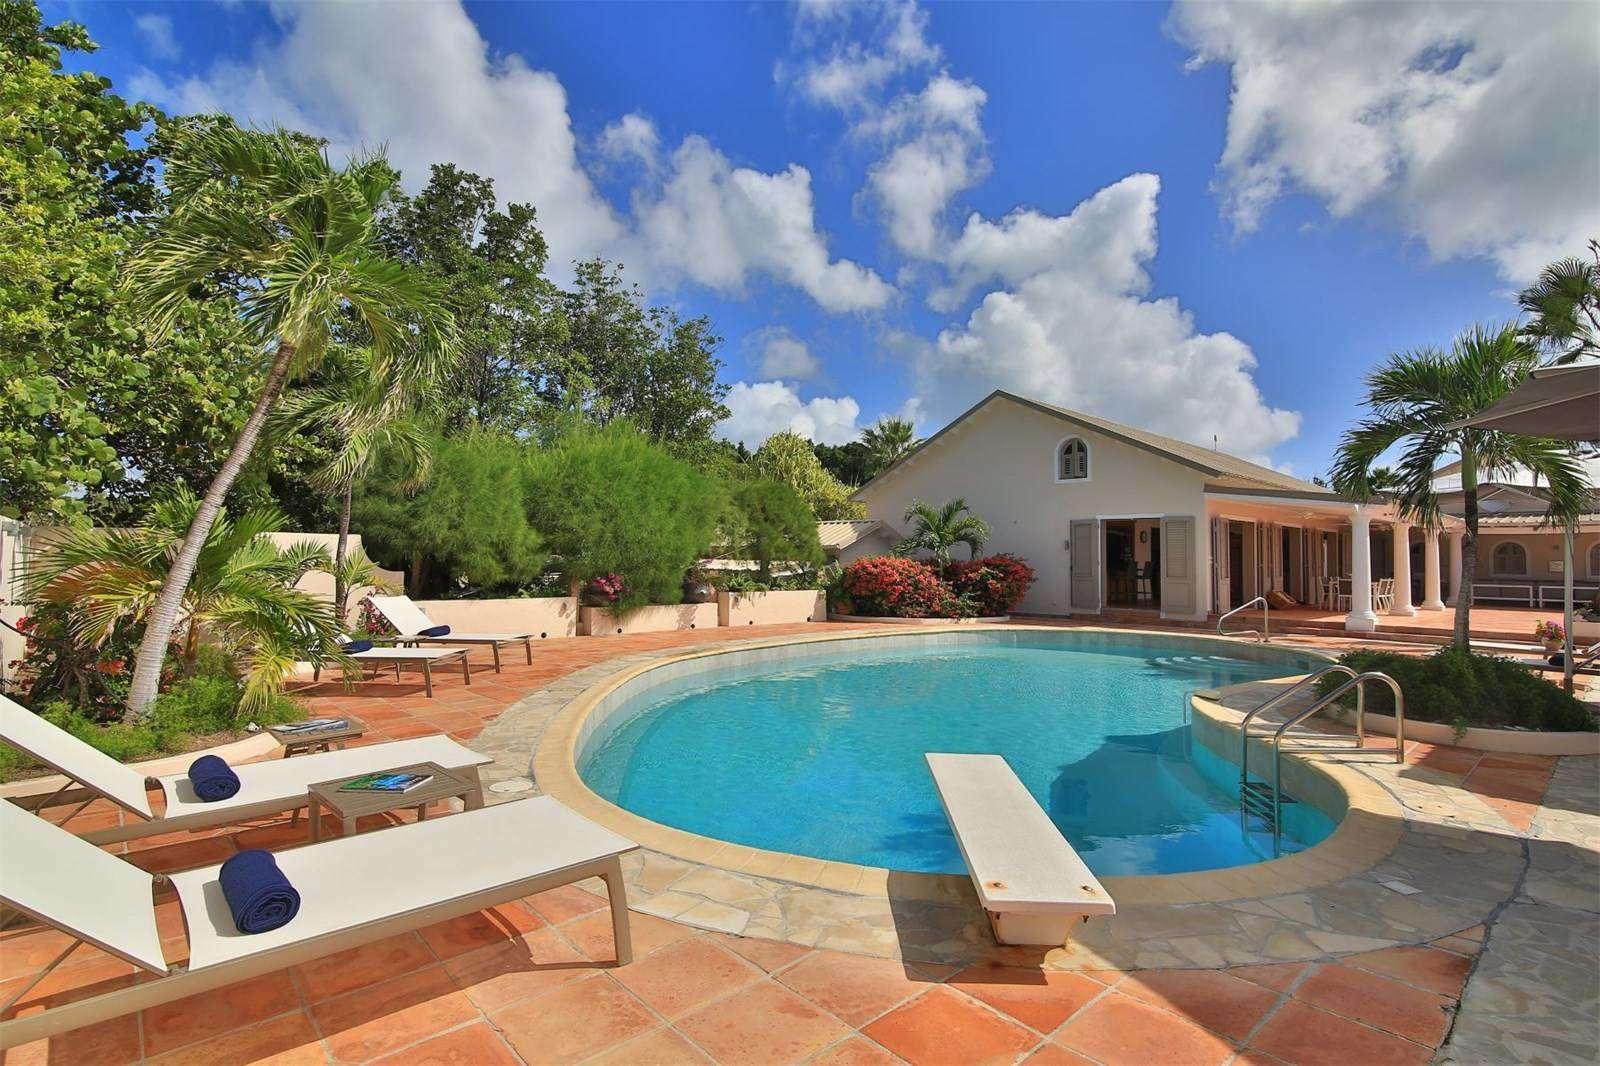 Luxury villa rentals caribbean - St martin - Saint martin french - Les terres basses - Les Trois Jours - Image 1/24